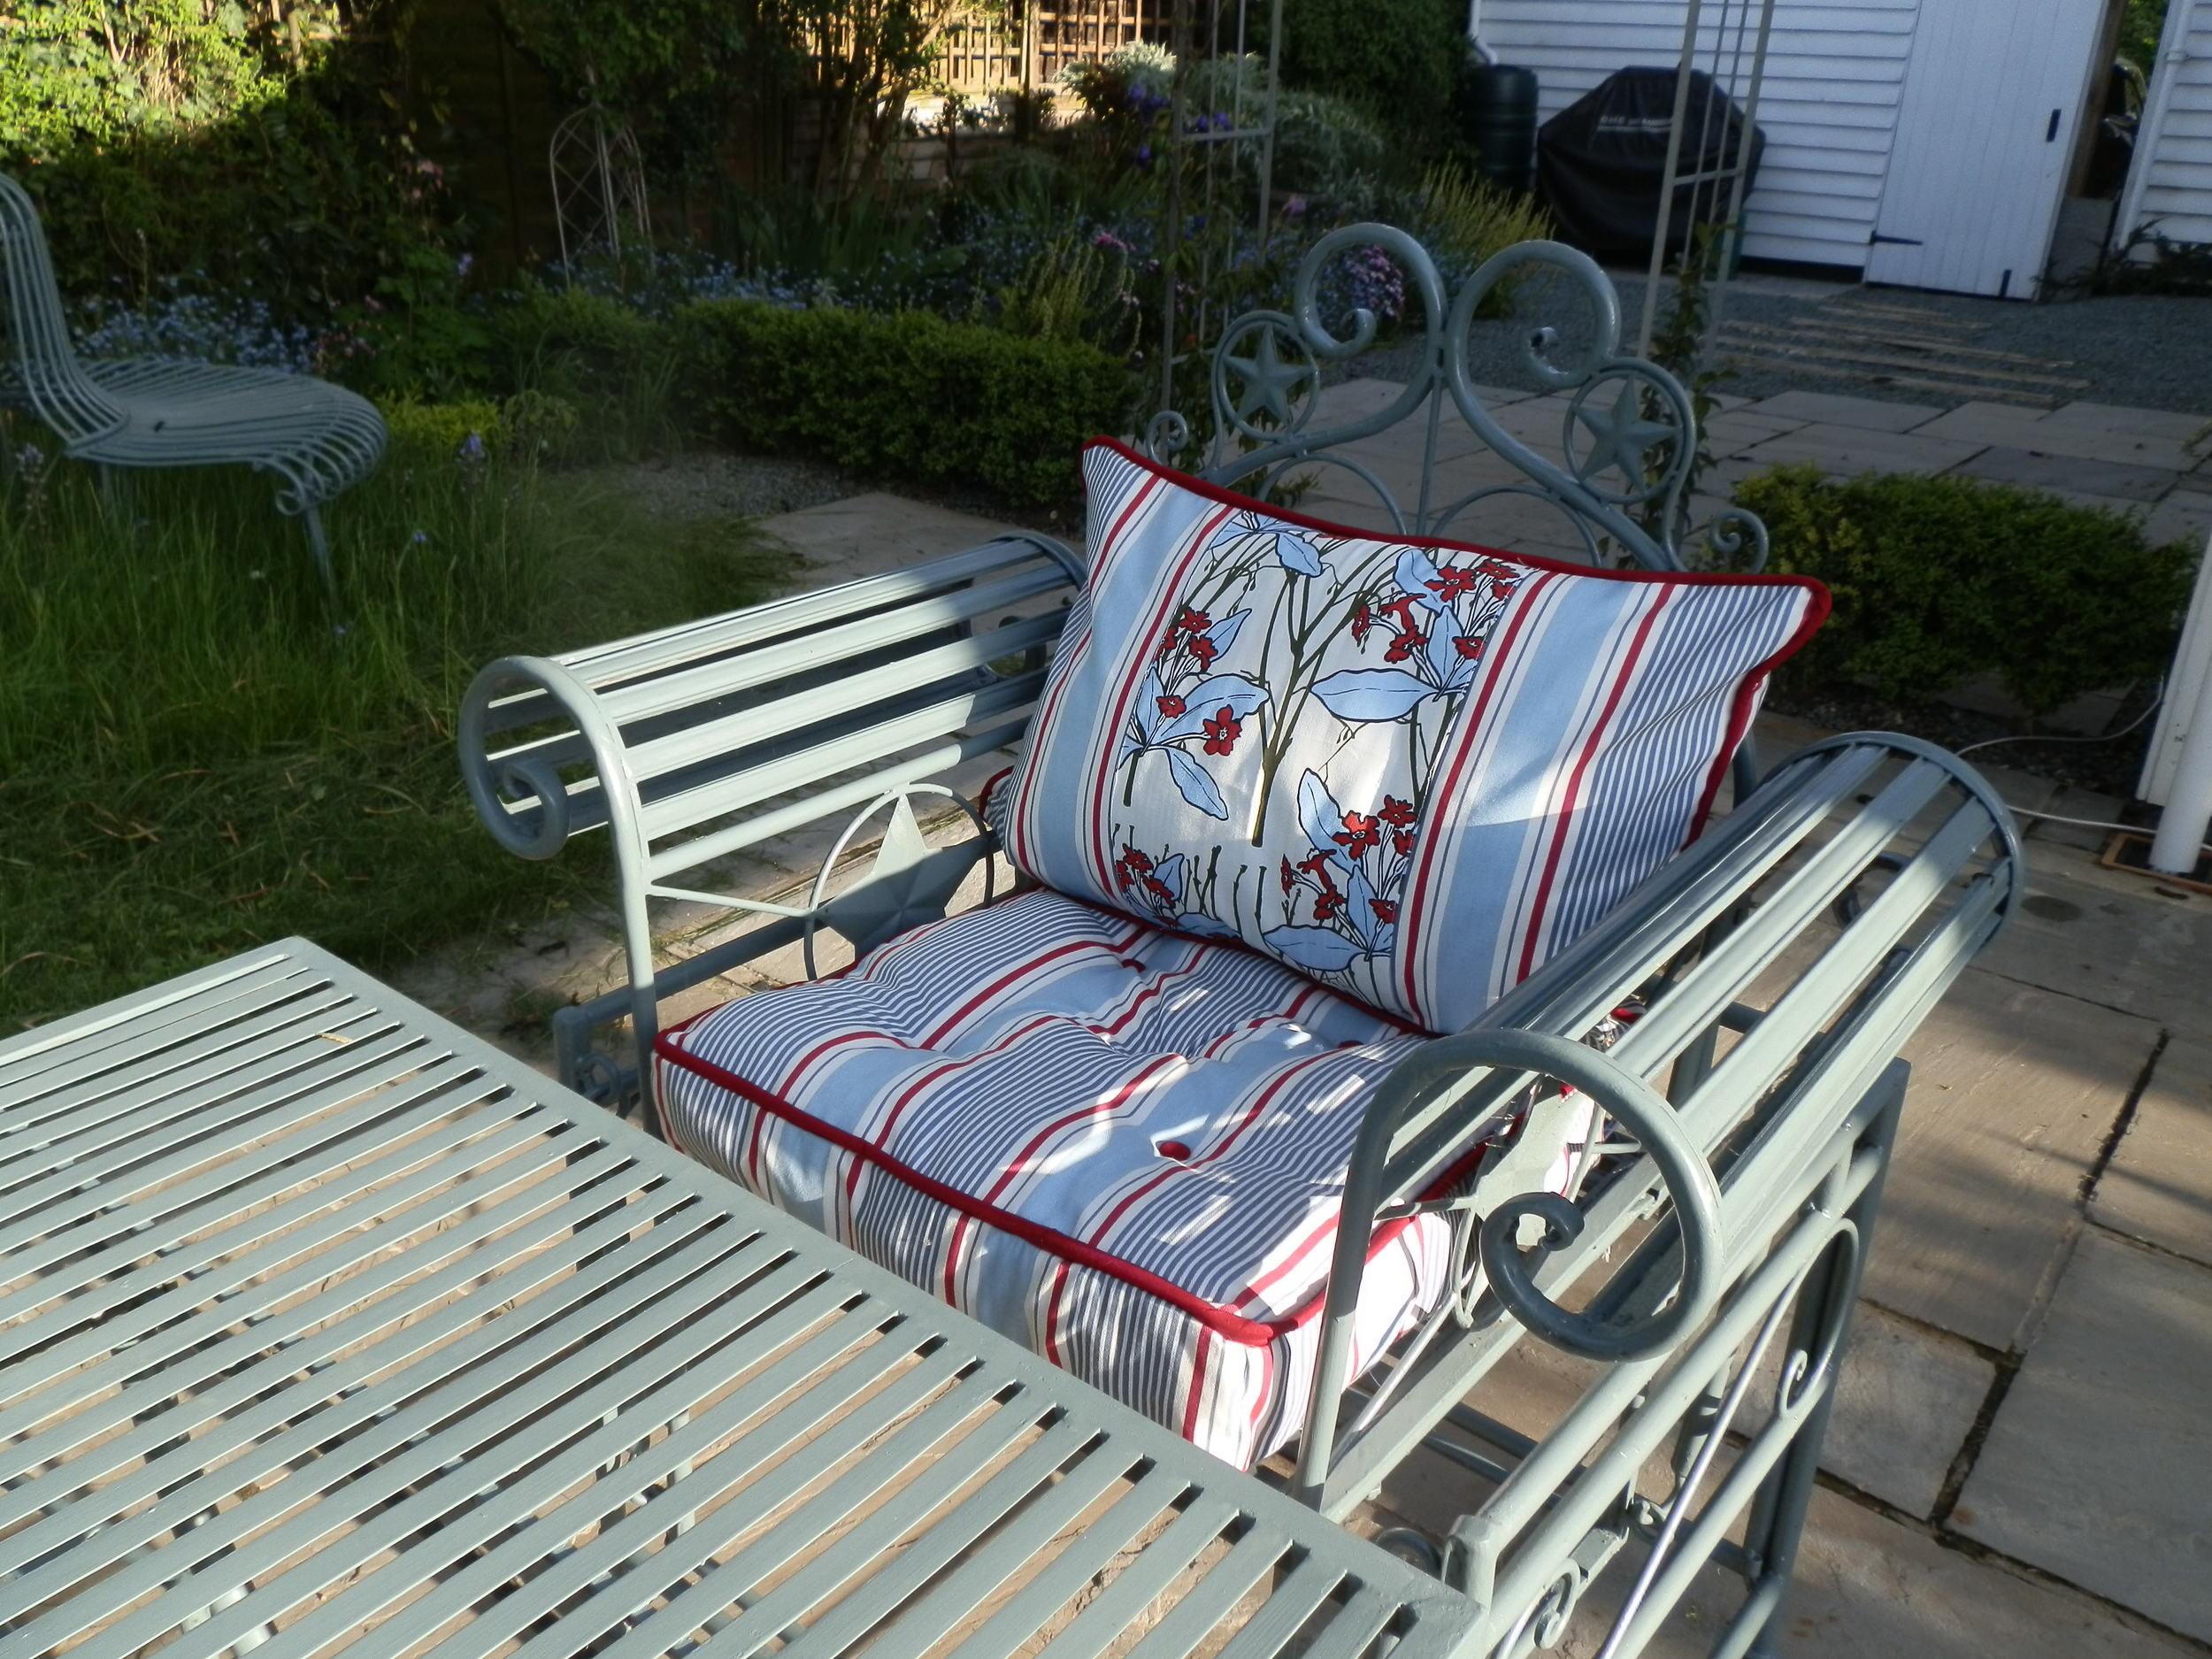 new garden cushions.jpg